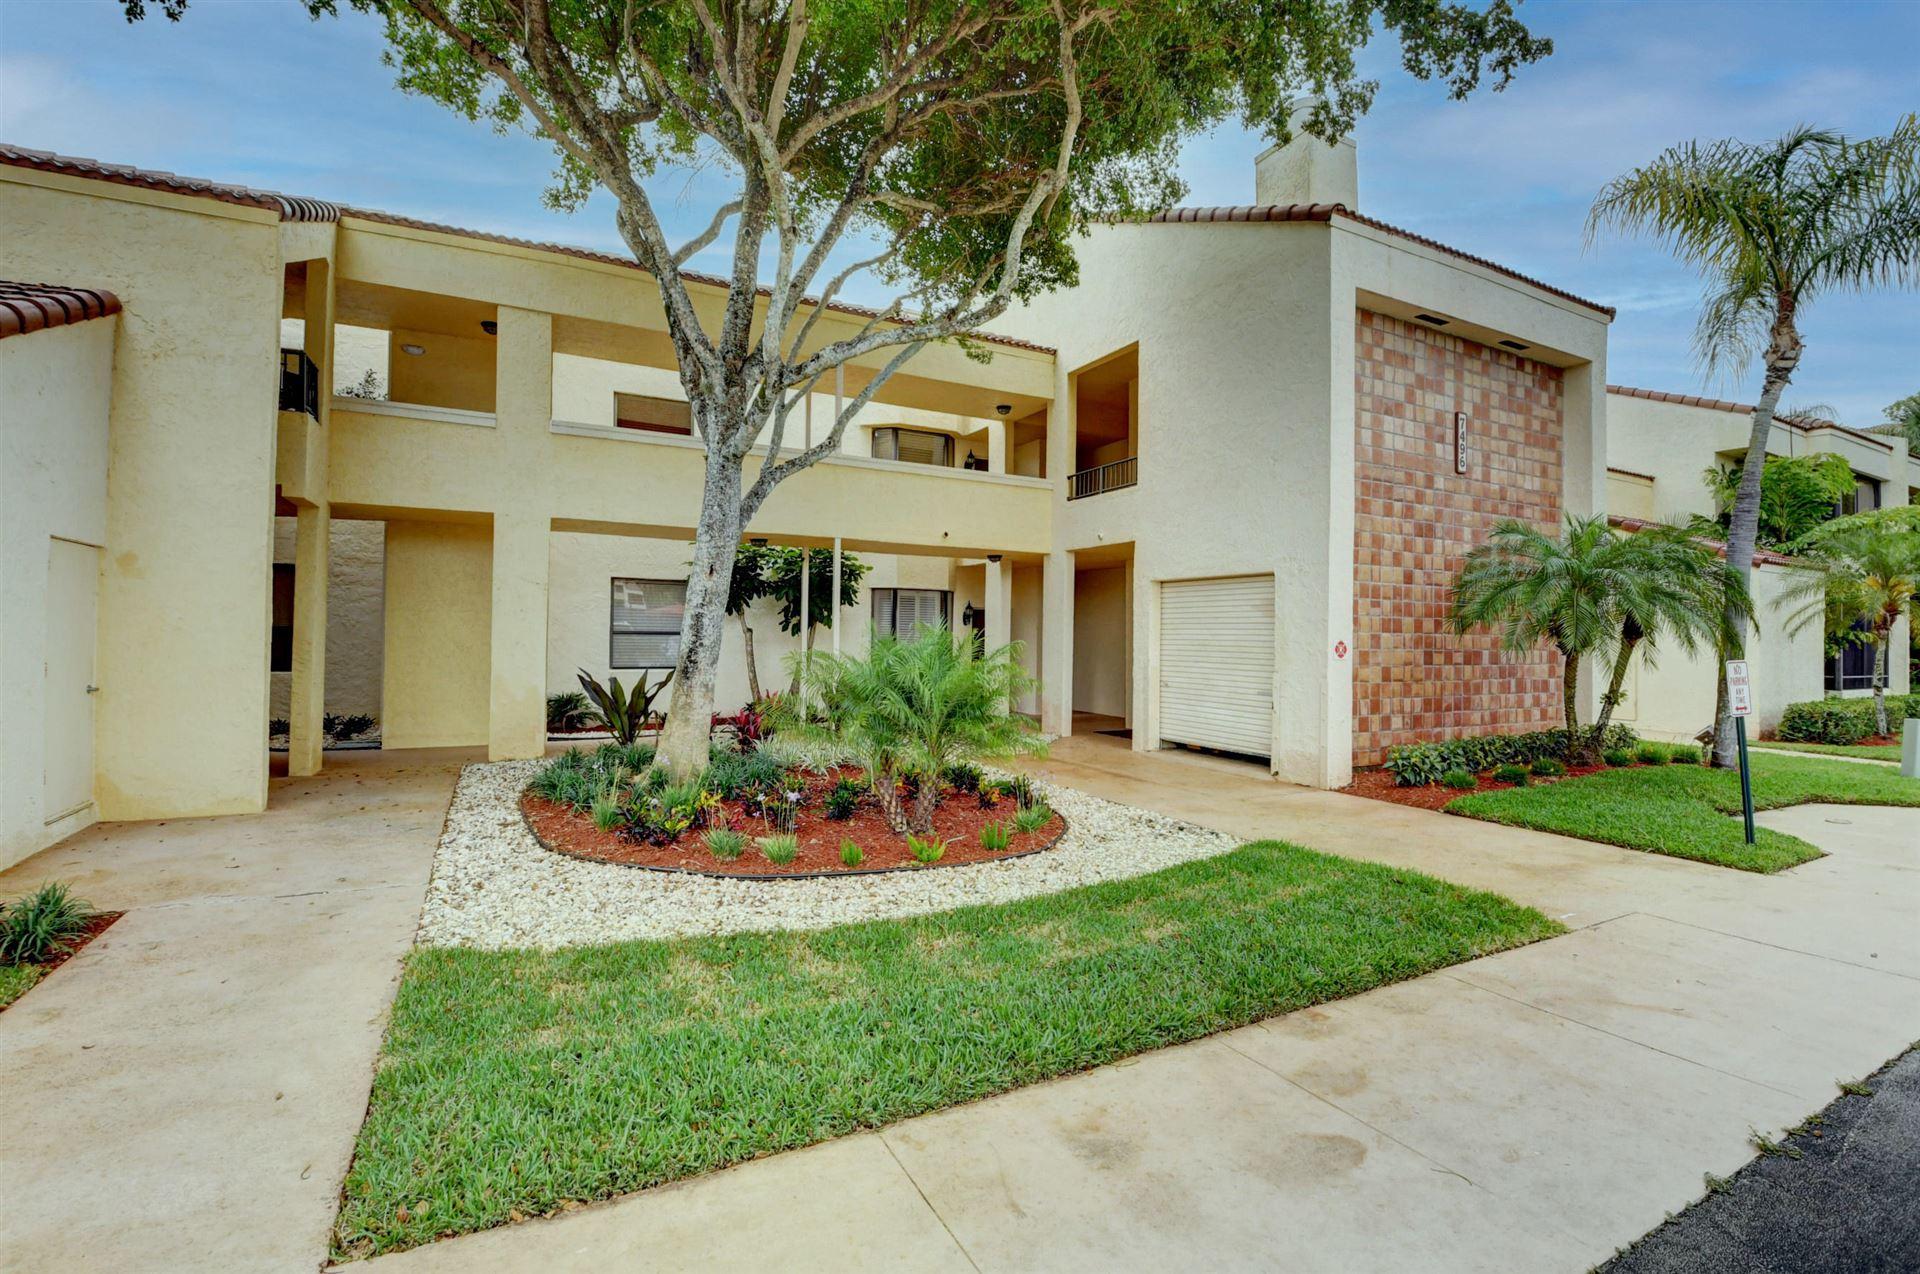 7496 La Paz Boulevard #106, Boca Raton, FL 33433 - MLS#: RX-10710590